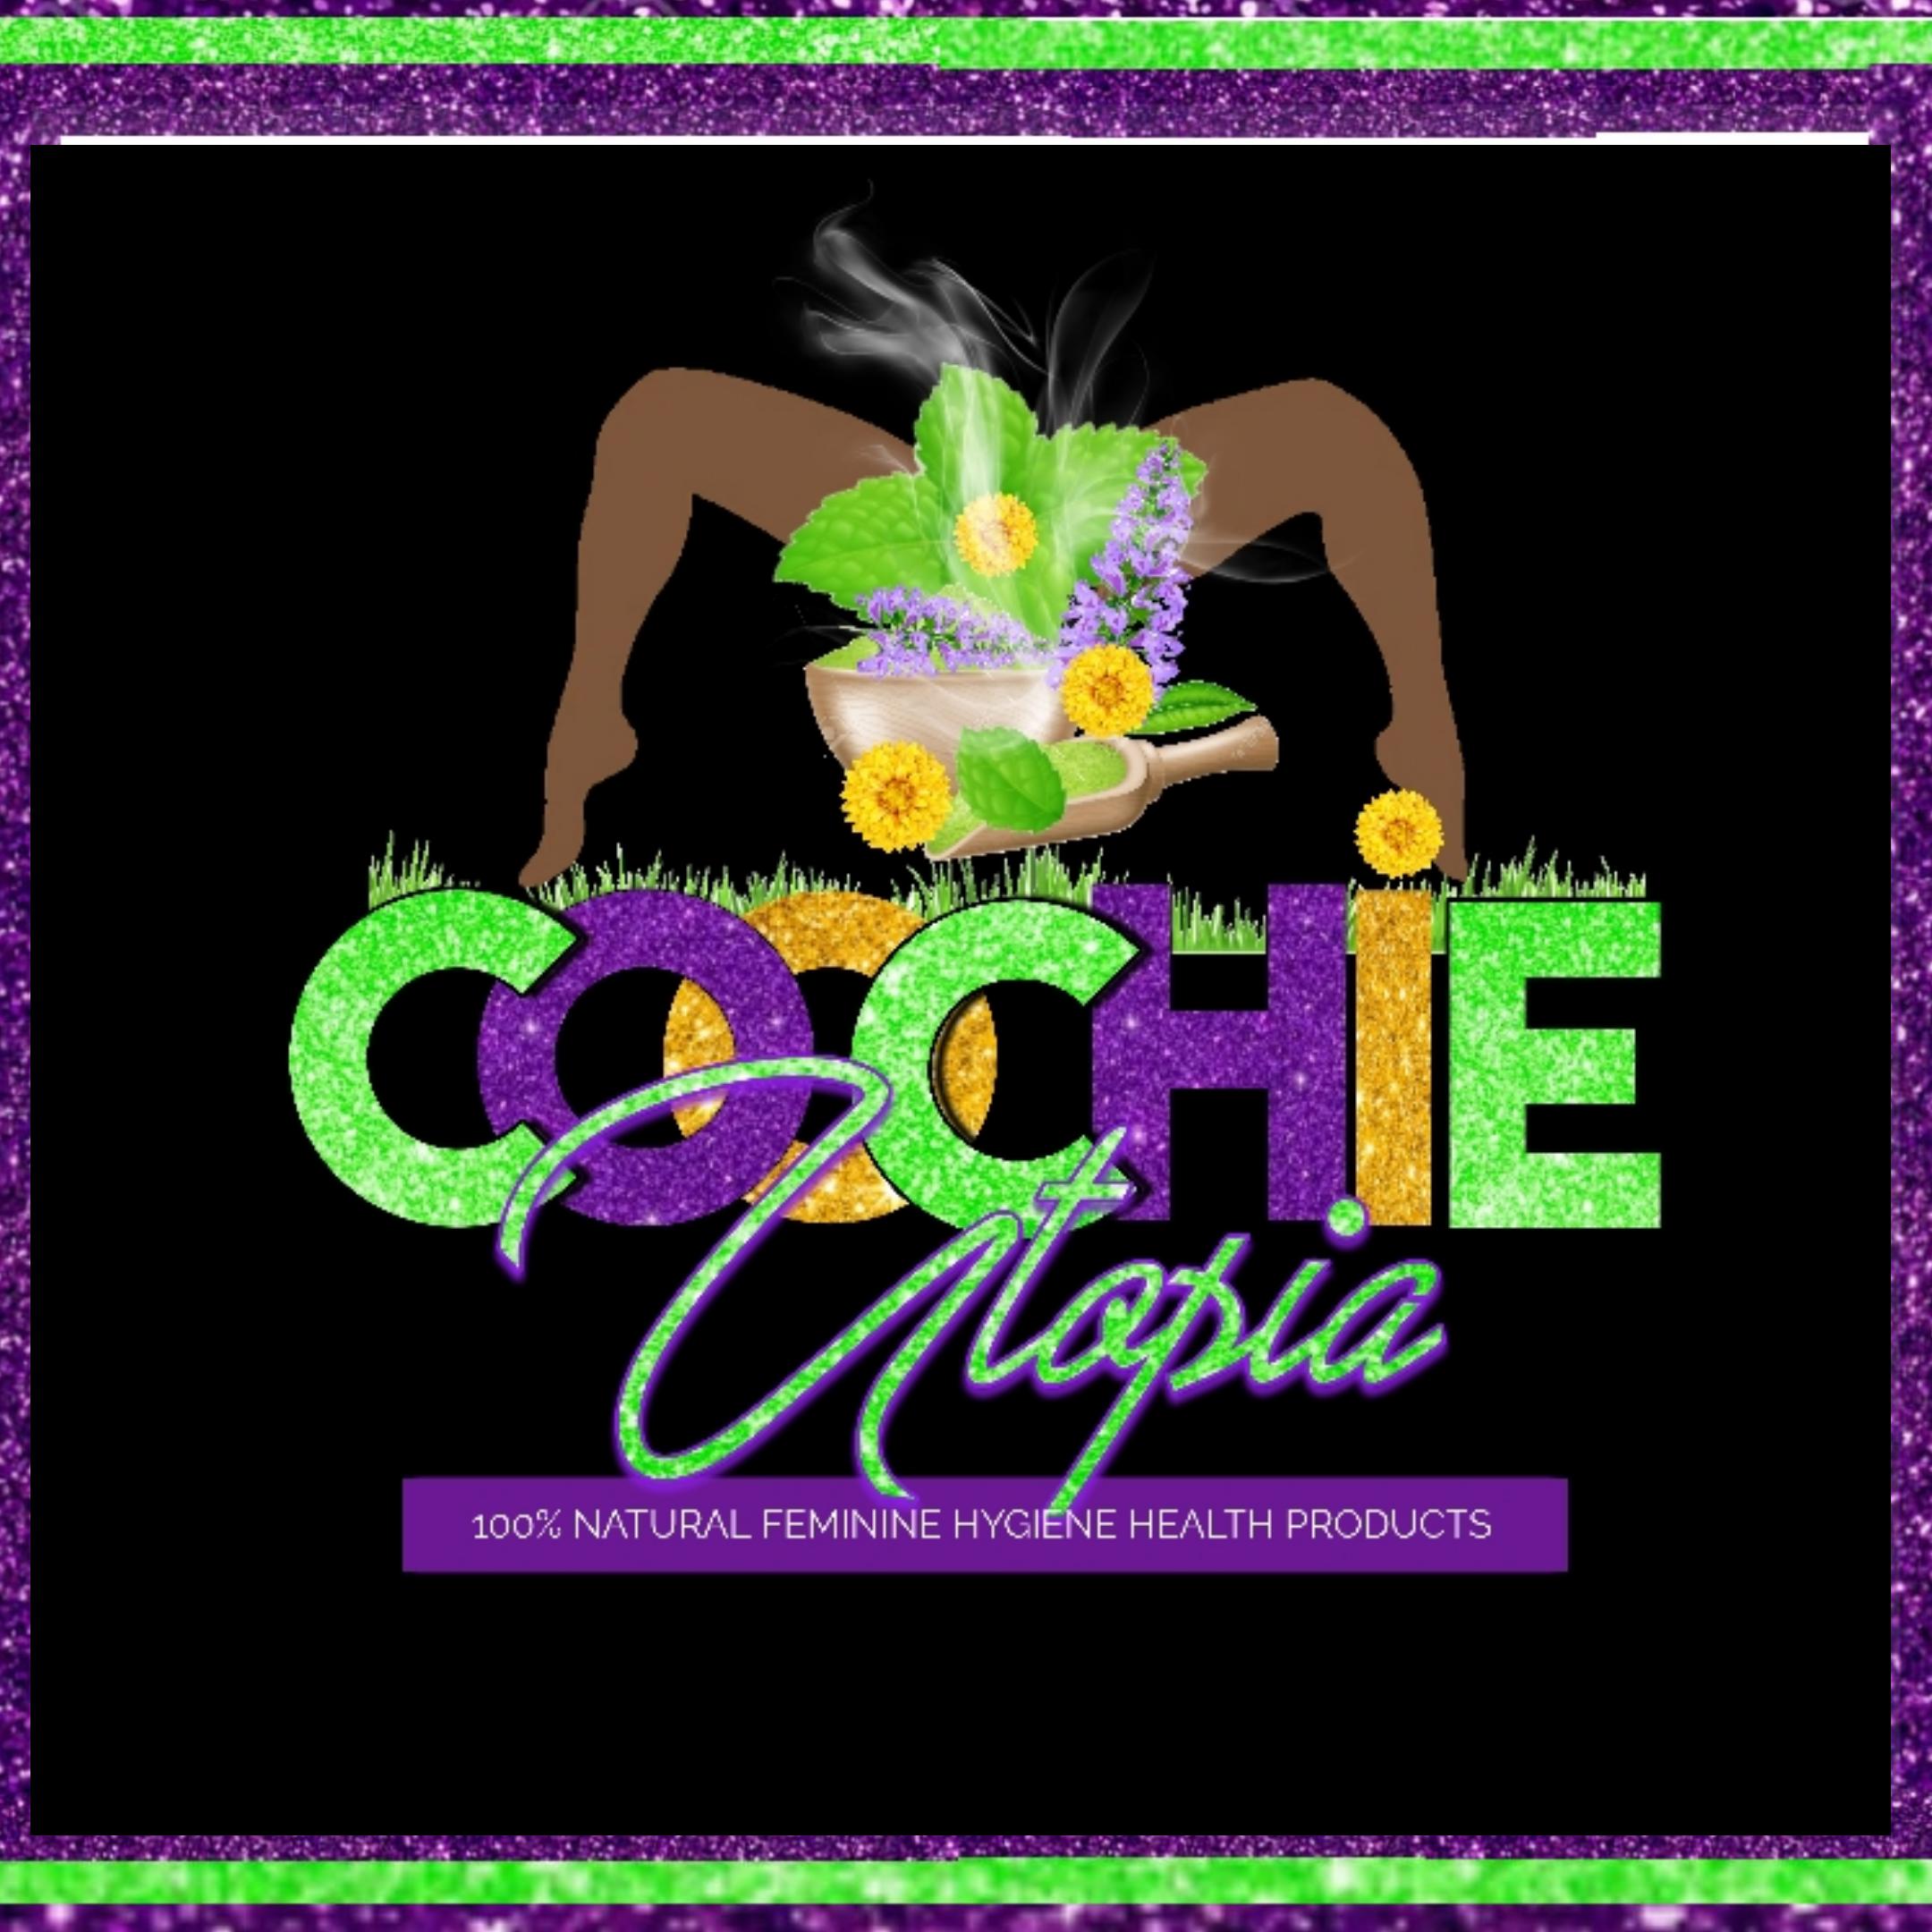 CoochieUtopia